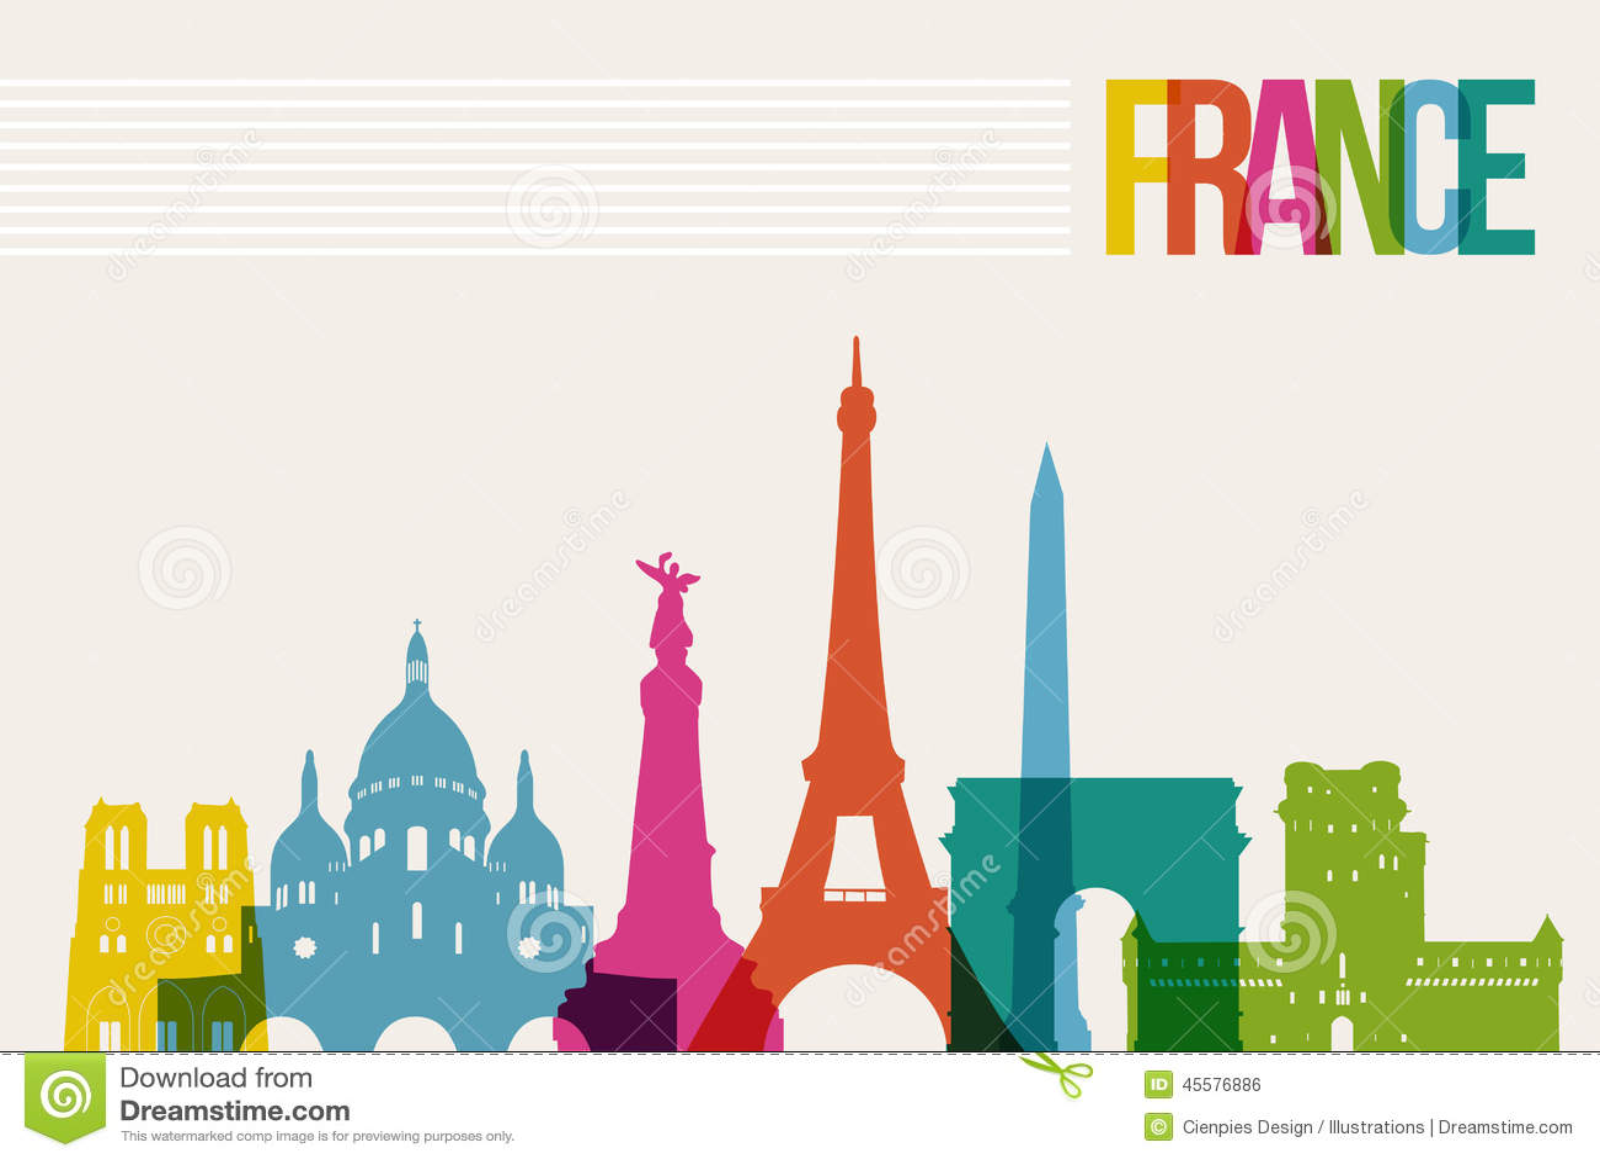 Travel France Destination Landmarks Skyline Illustration 45576886